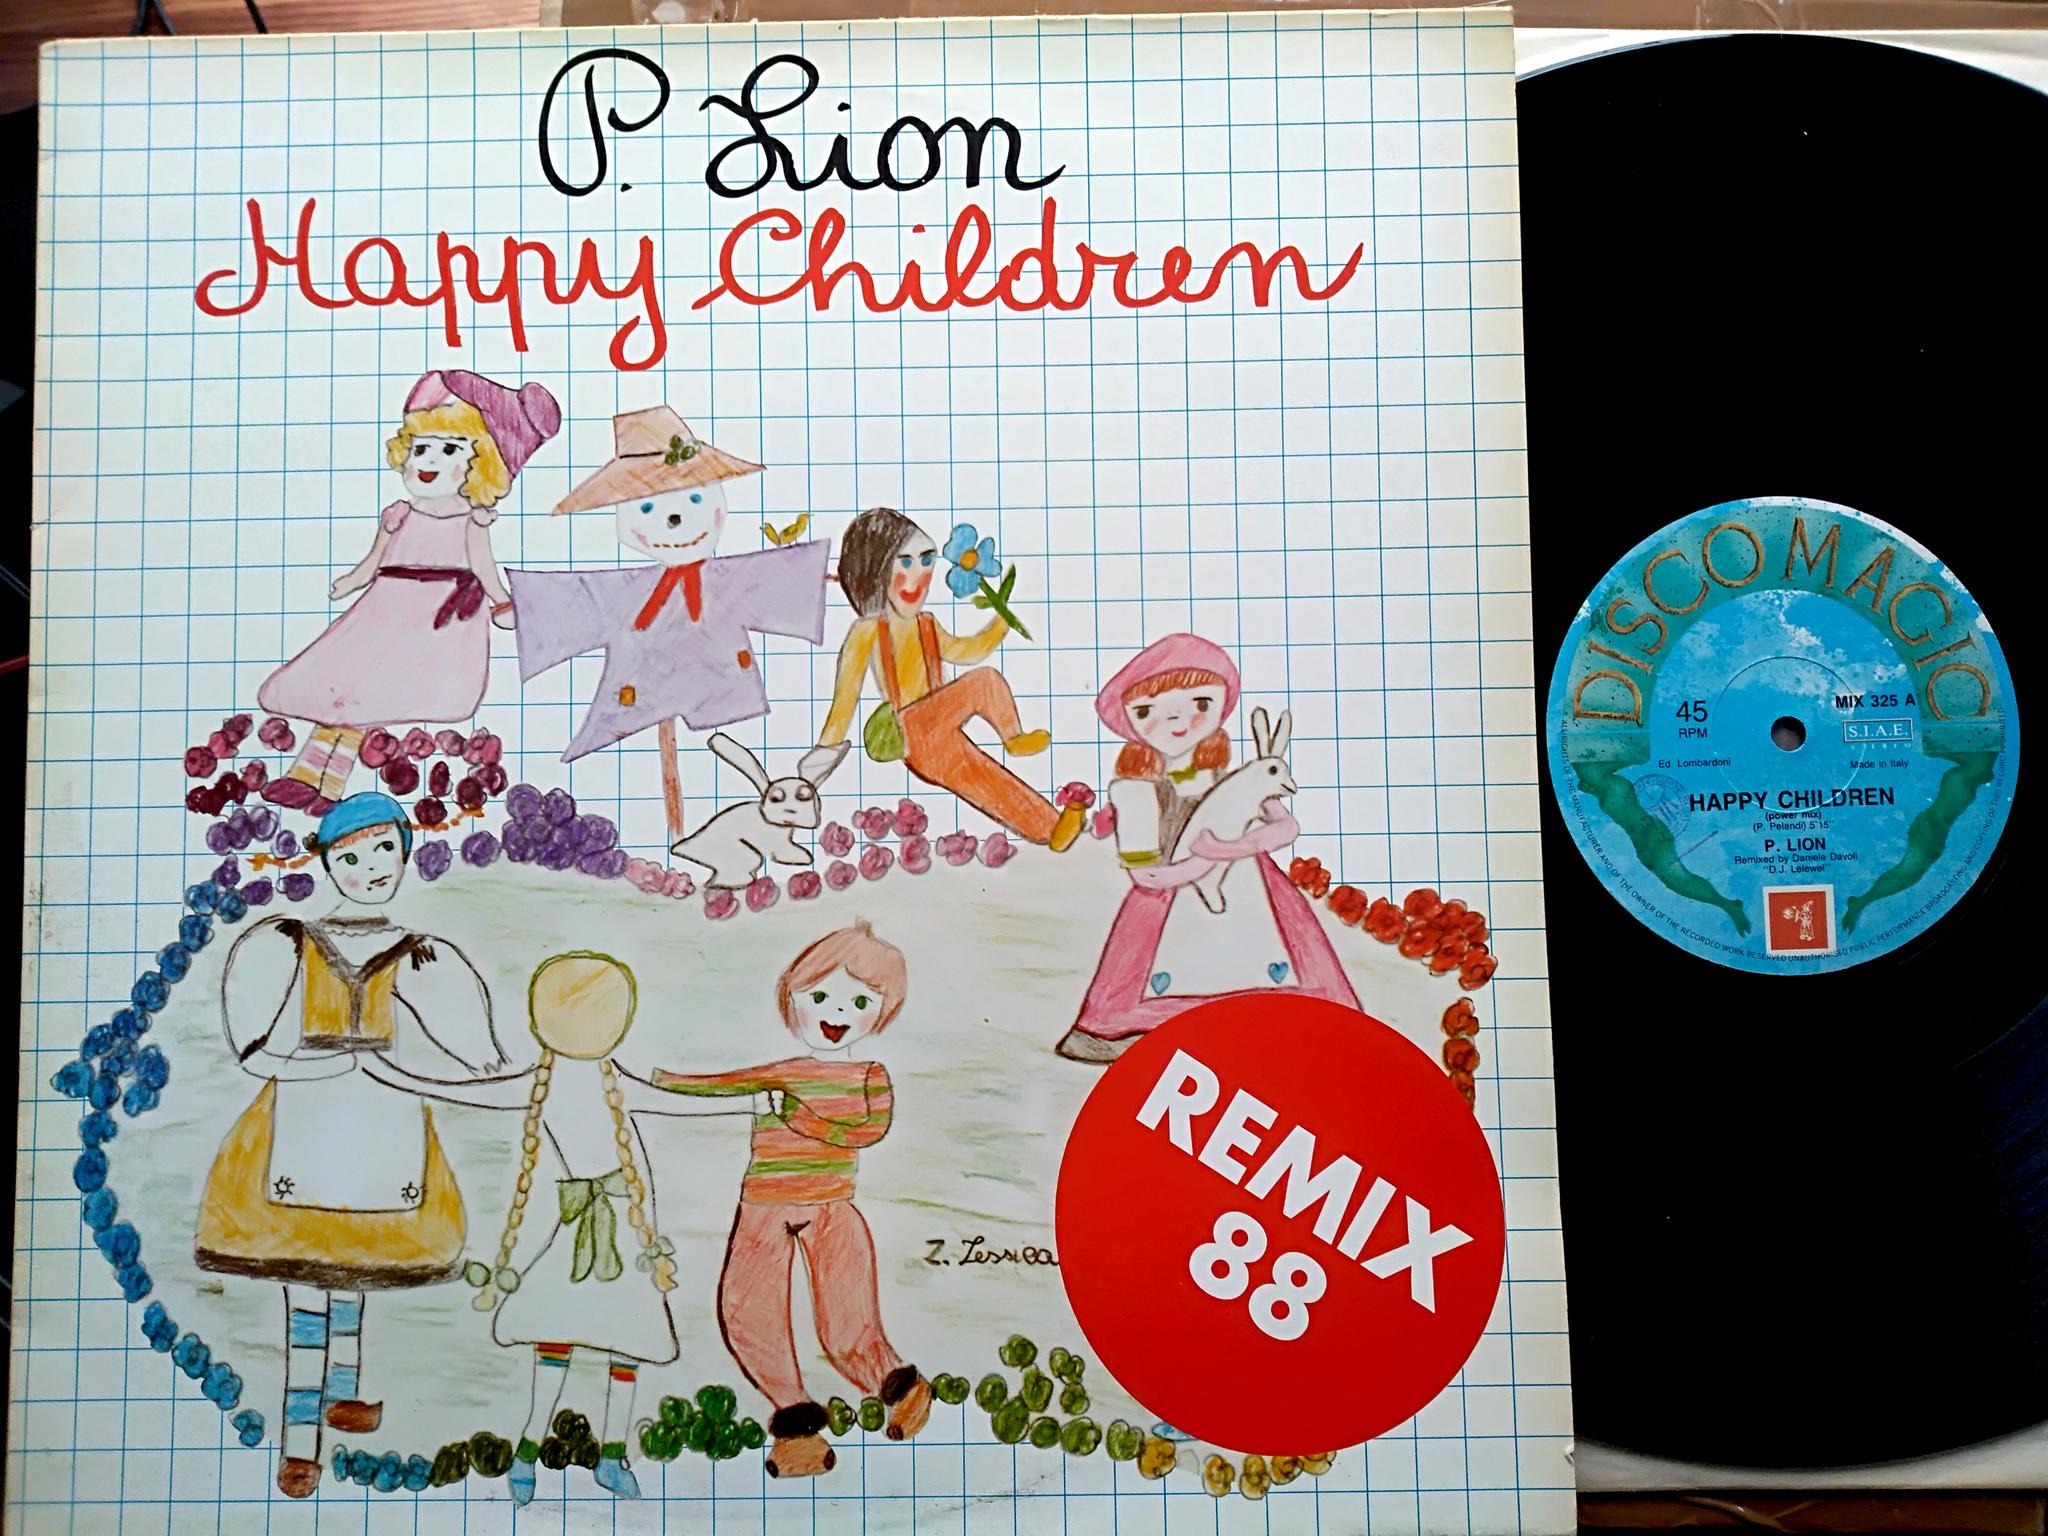 P. Lion - Happy Children (Remix 88)